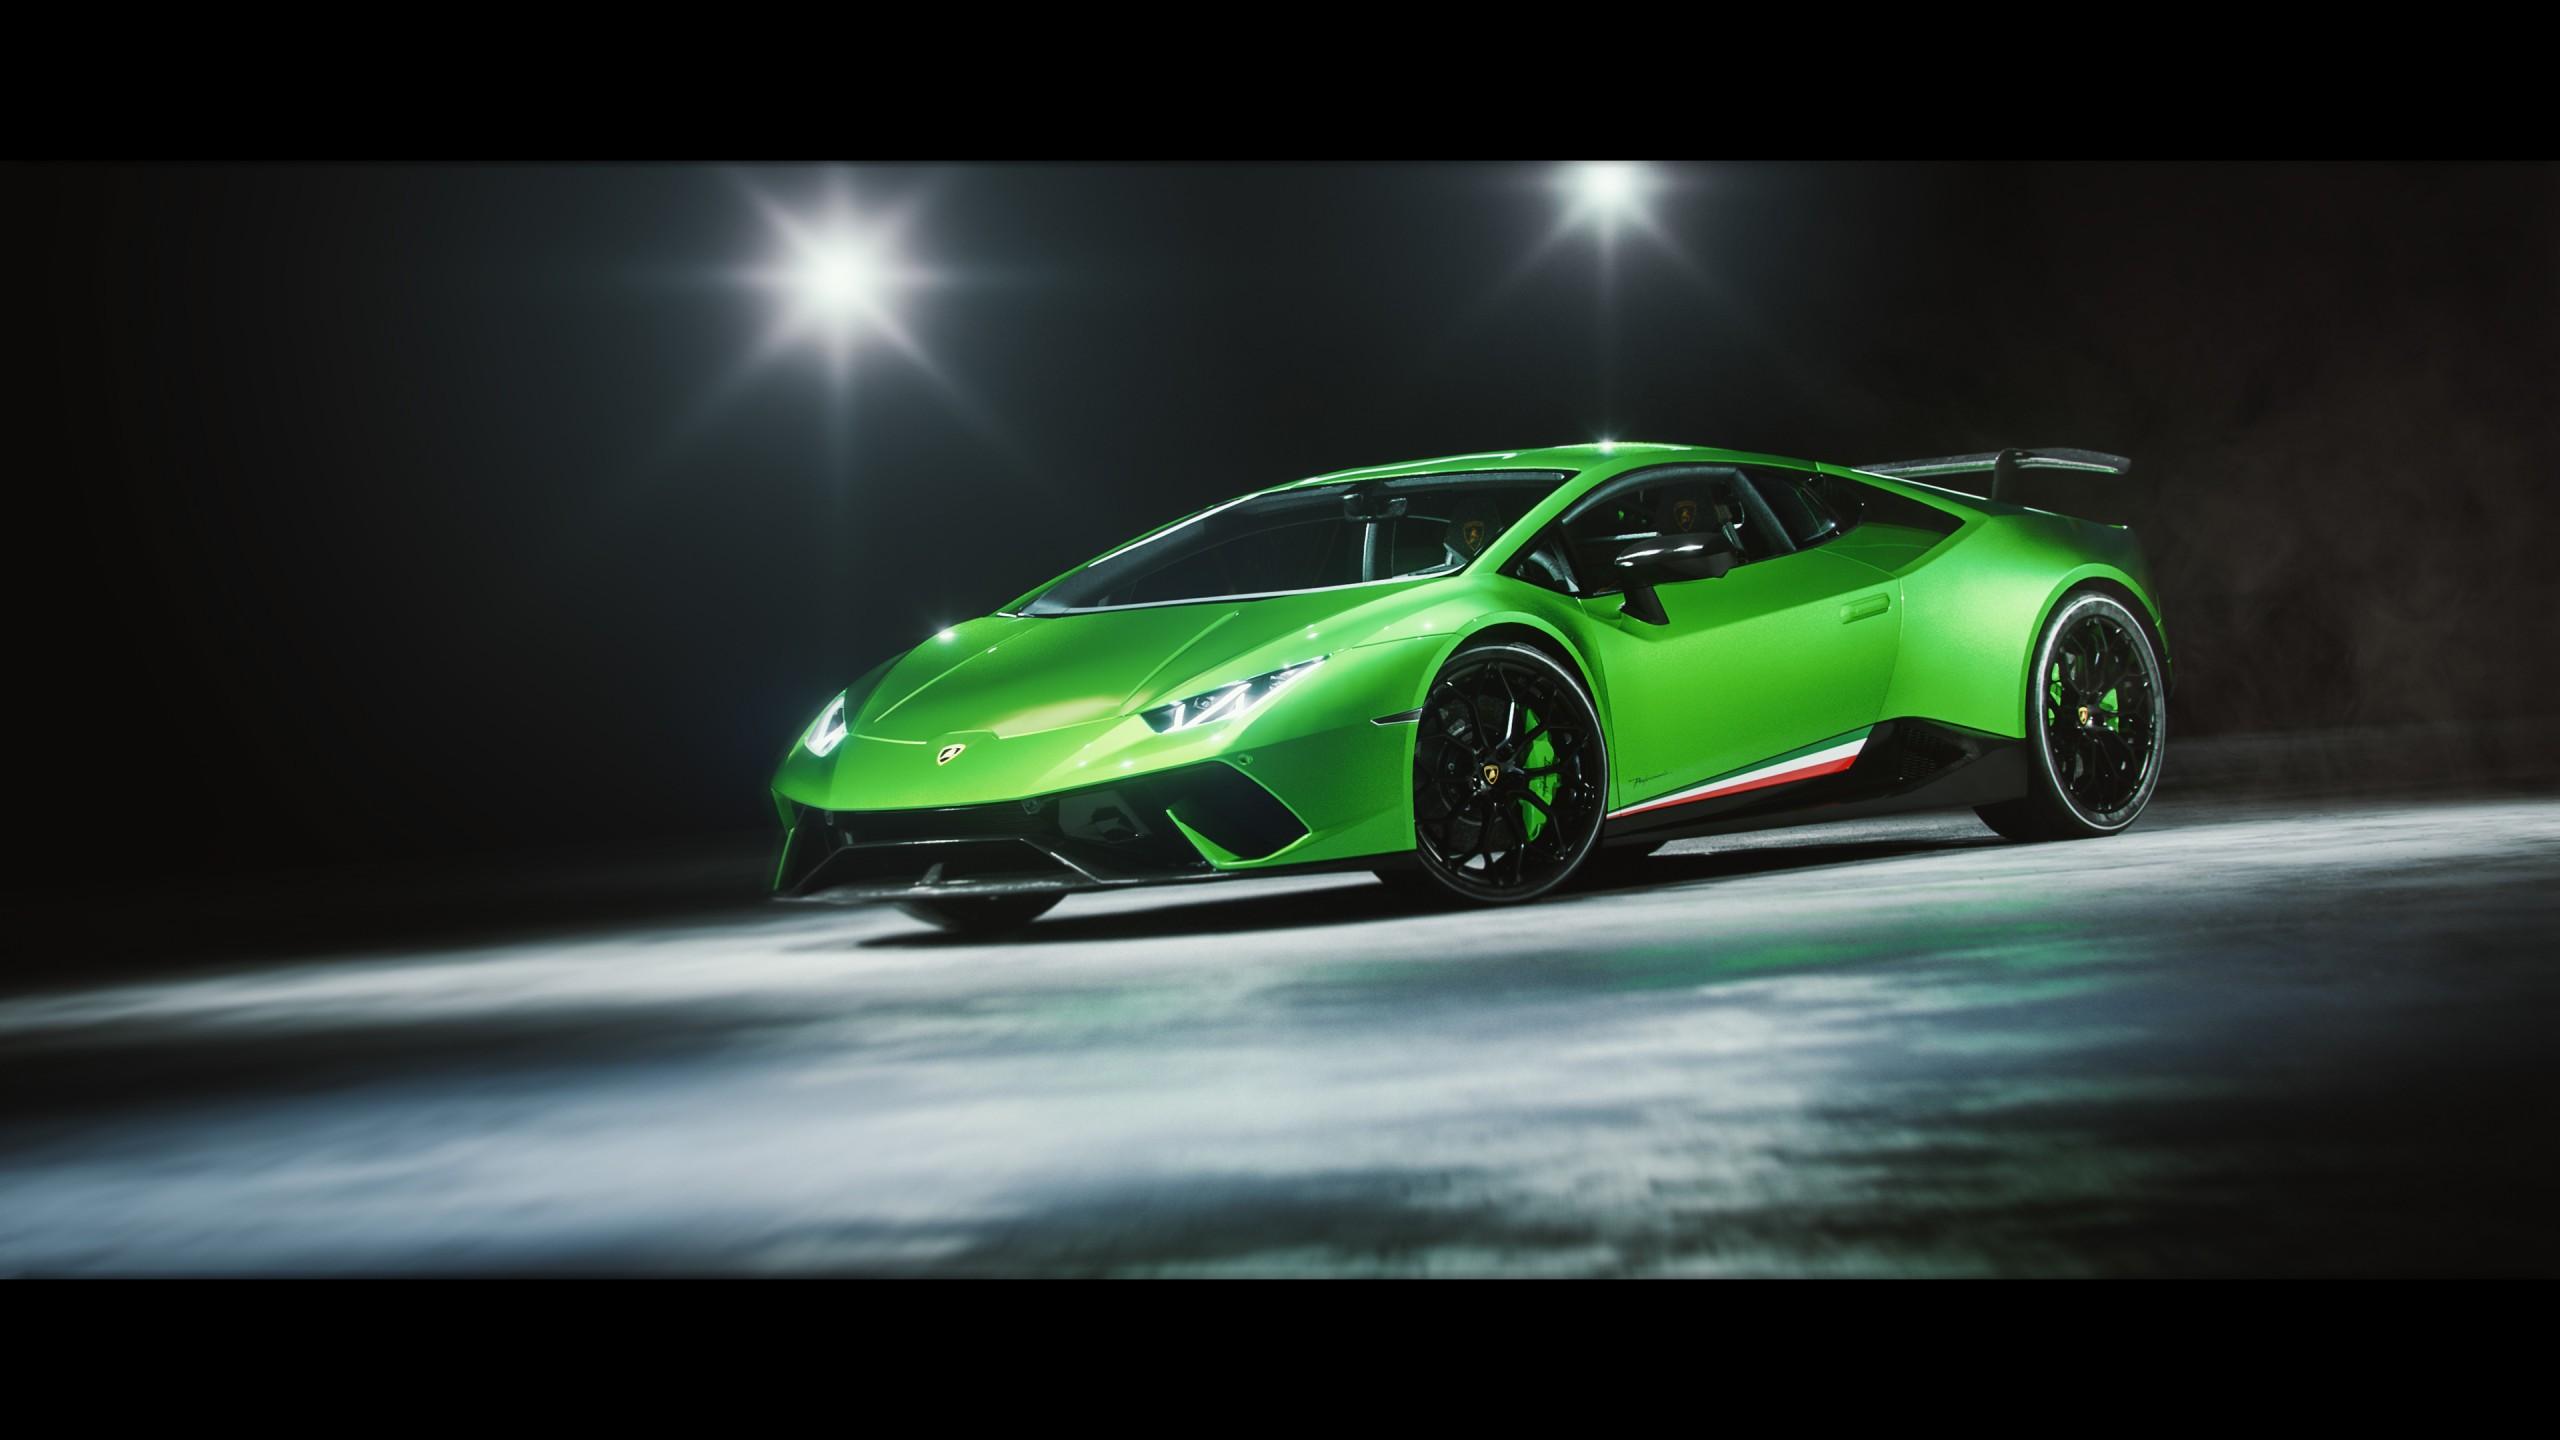 Nissan Sports Car >> Lamborghini Huracan Performante 4K Wallpaper   HD Car Wallpapers   ID #10784